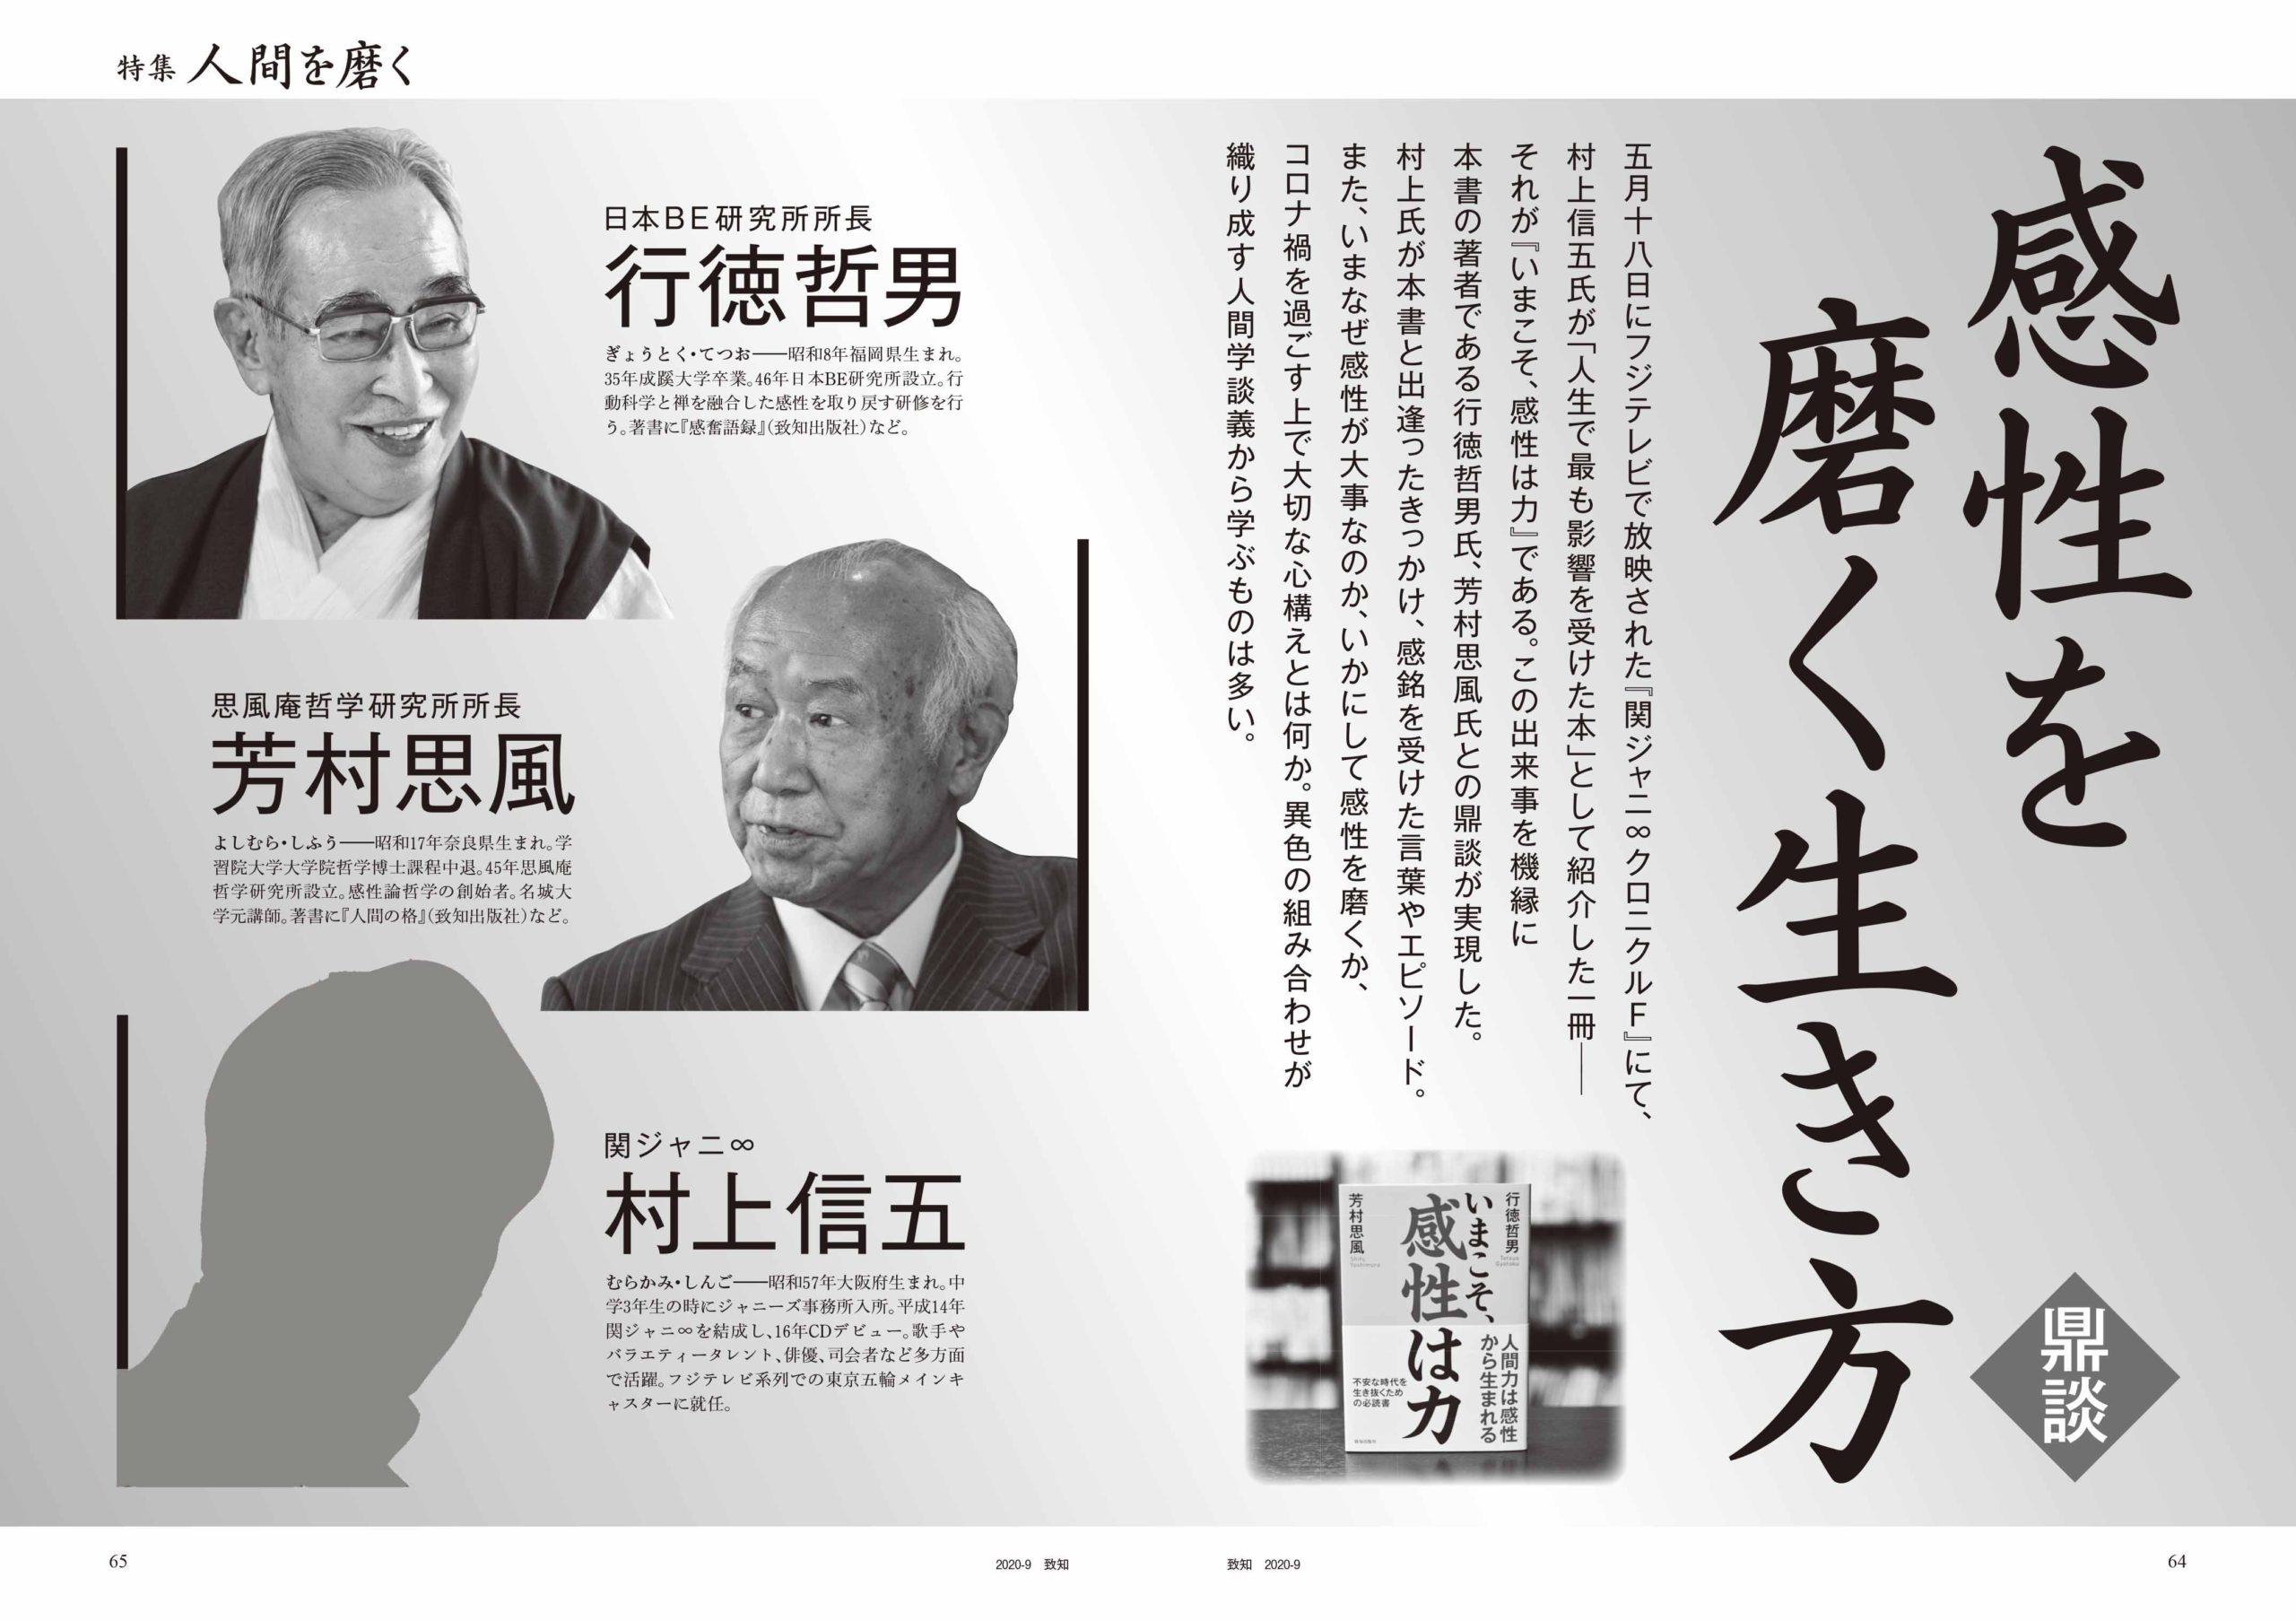 o4299303514803070141 1 scaled - 東京思風塾、次回9月13日(日)開催になります。